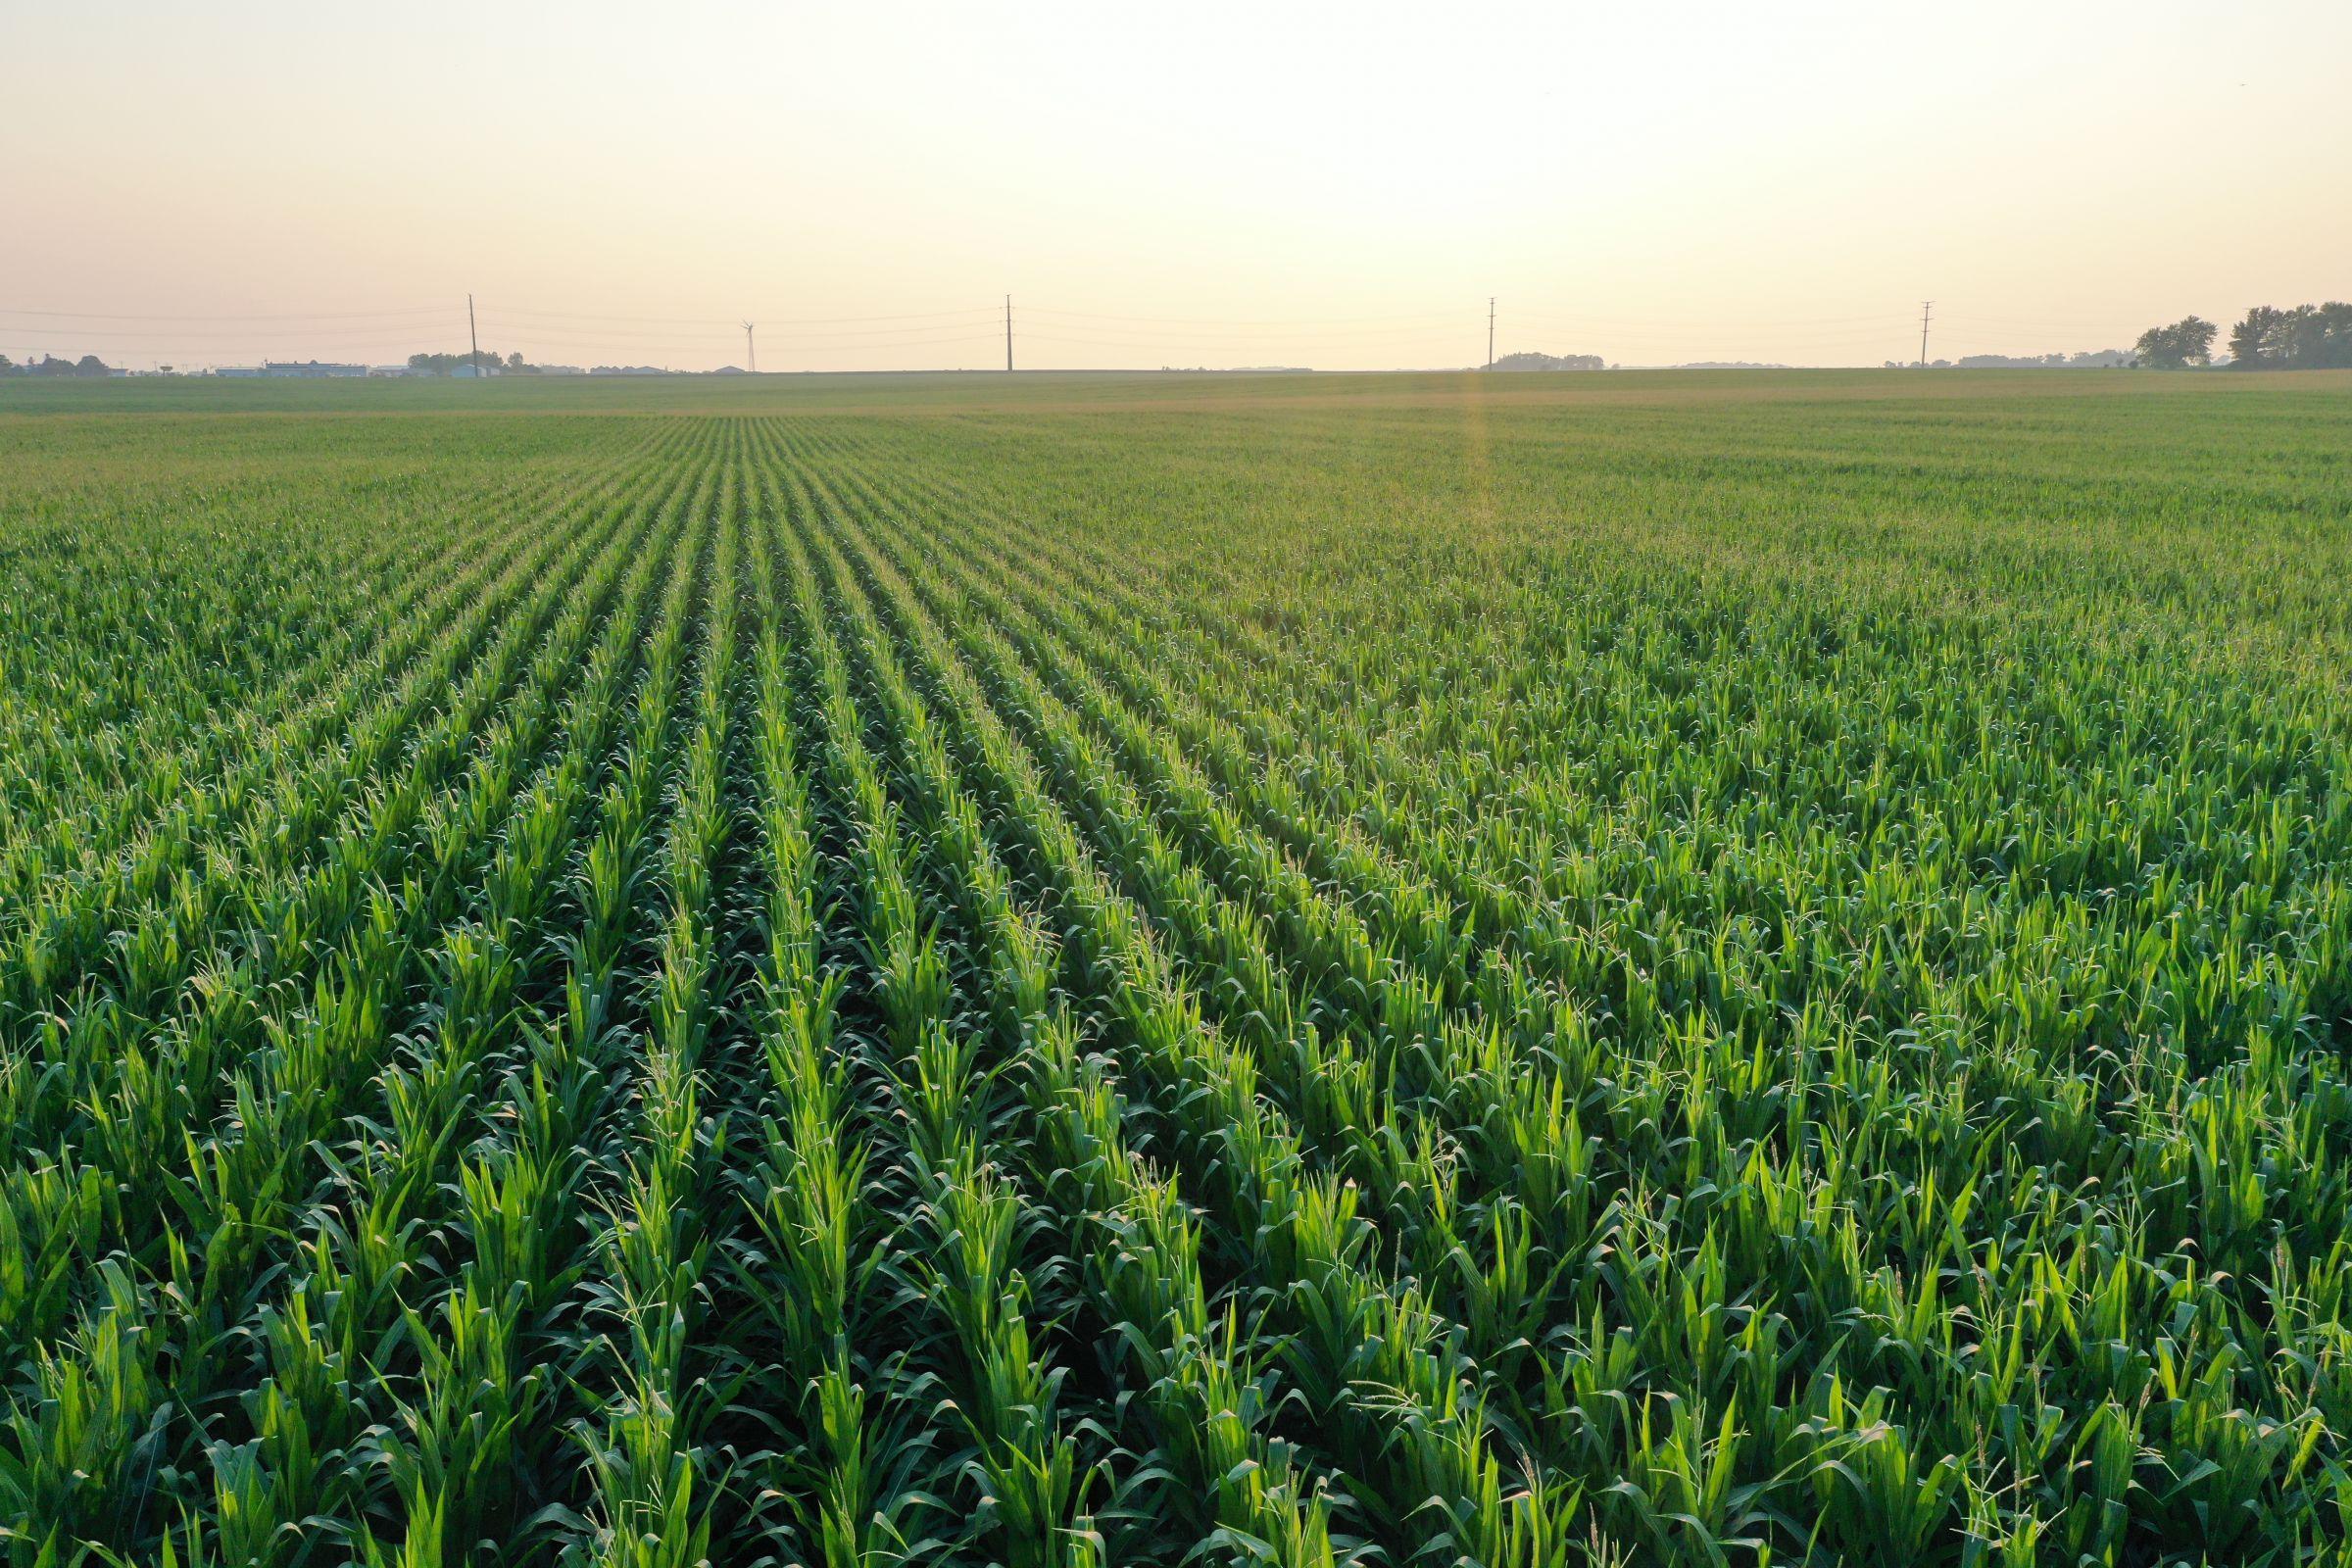 development-land-commercial-cerro-gordo-county-iowa-108-acres-listing-number-15644-1-2021-07-19-140718.JPG